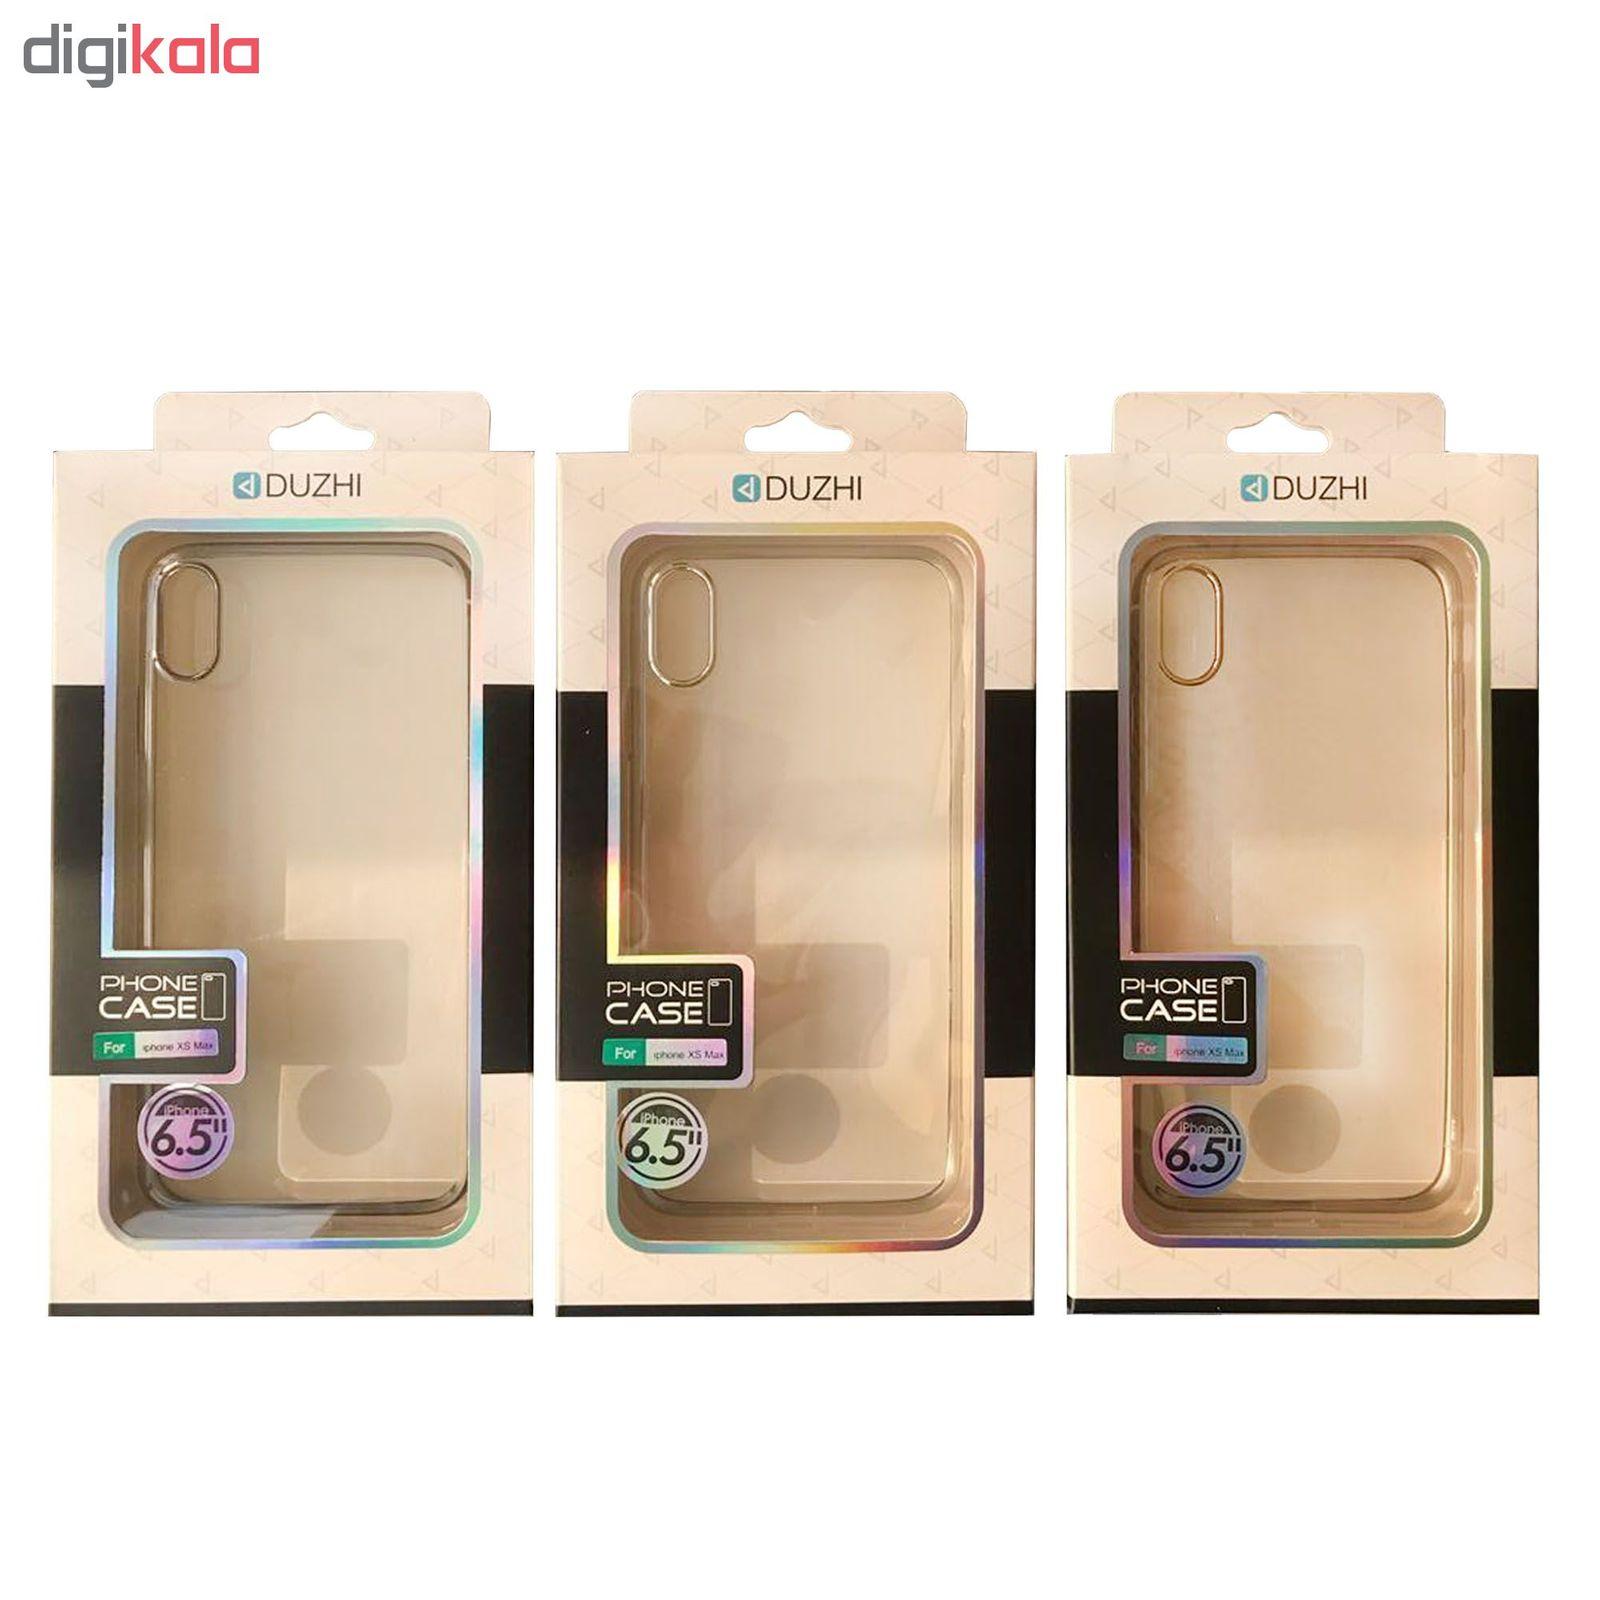 کاور آی دوژی مدل Electroplate Pc مناسب برای گوشی موبایل اپل iPhone XS Max main 1 9